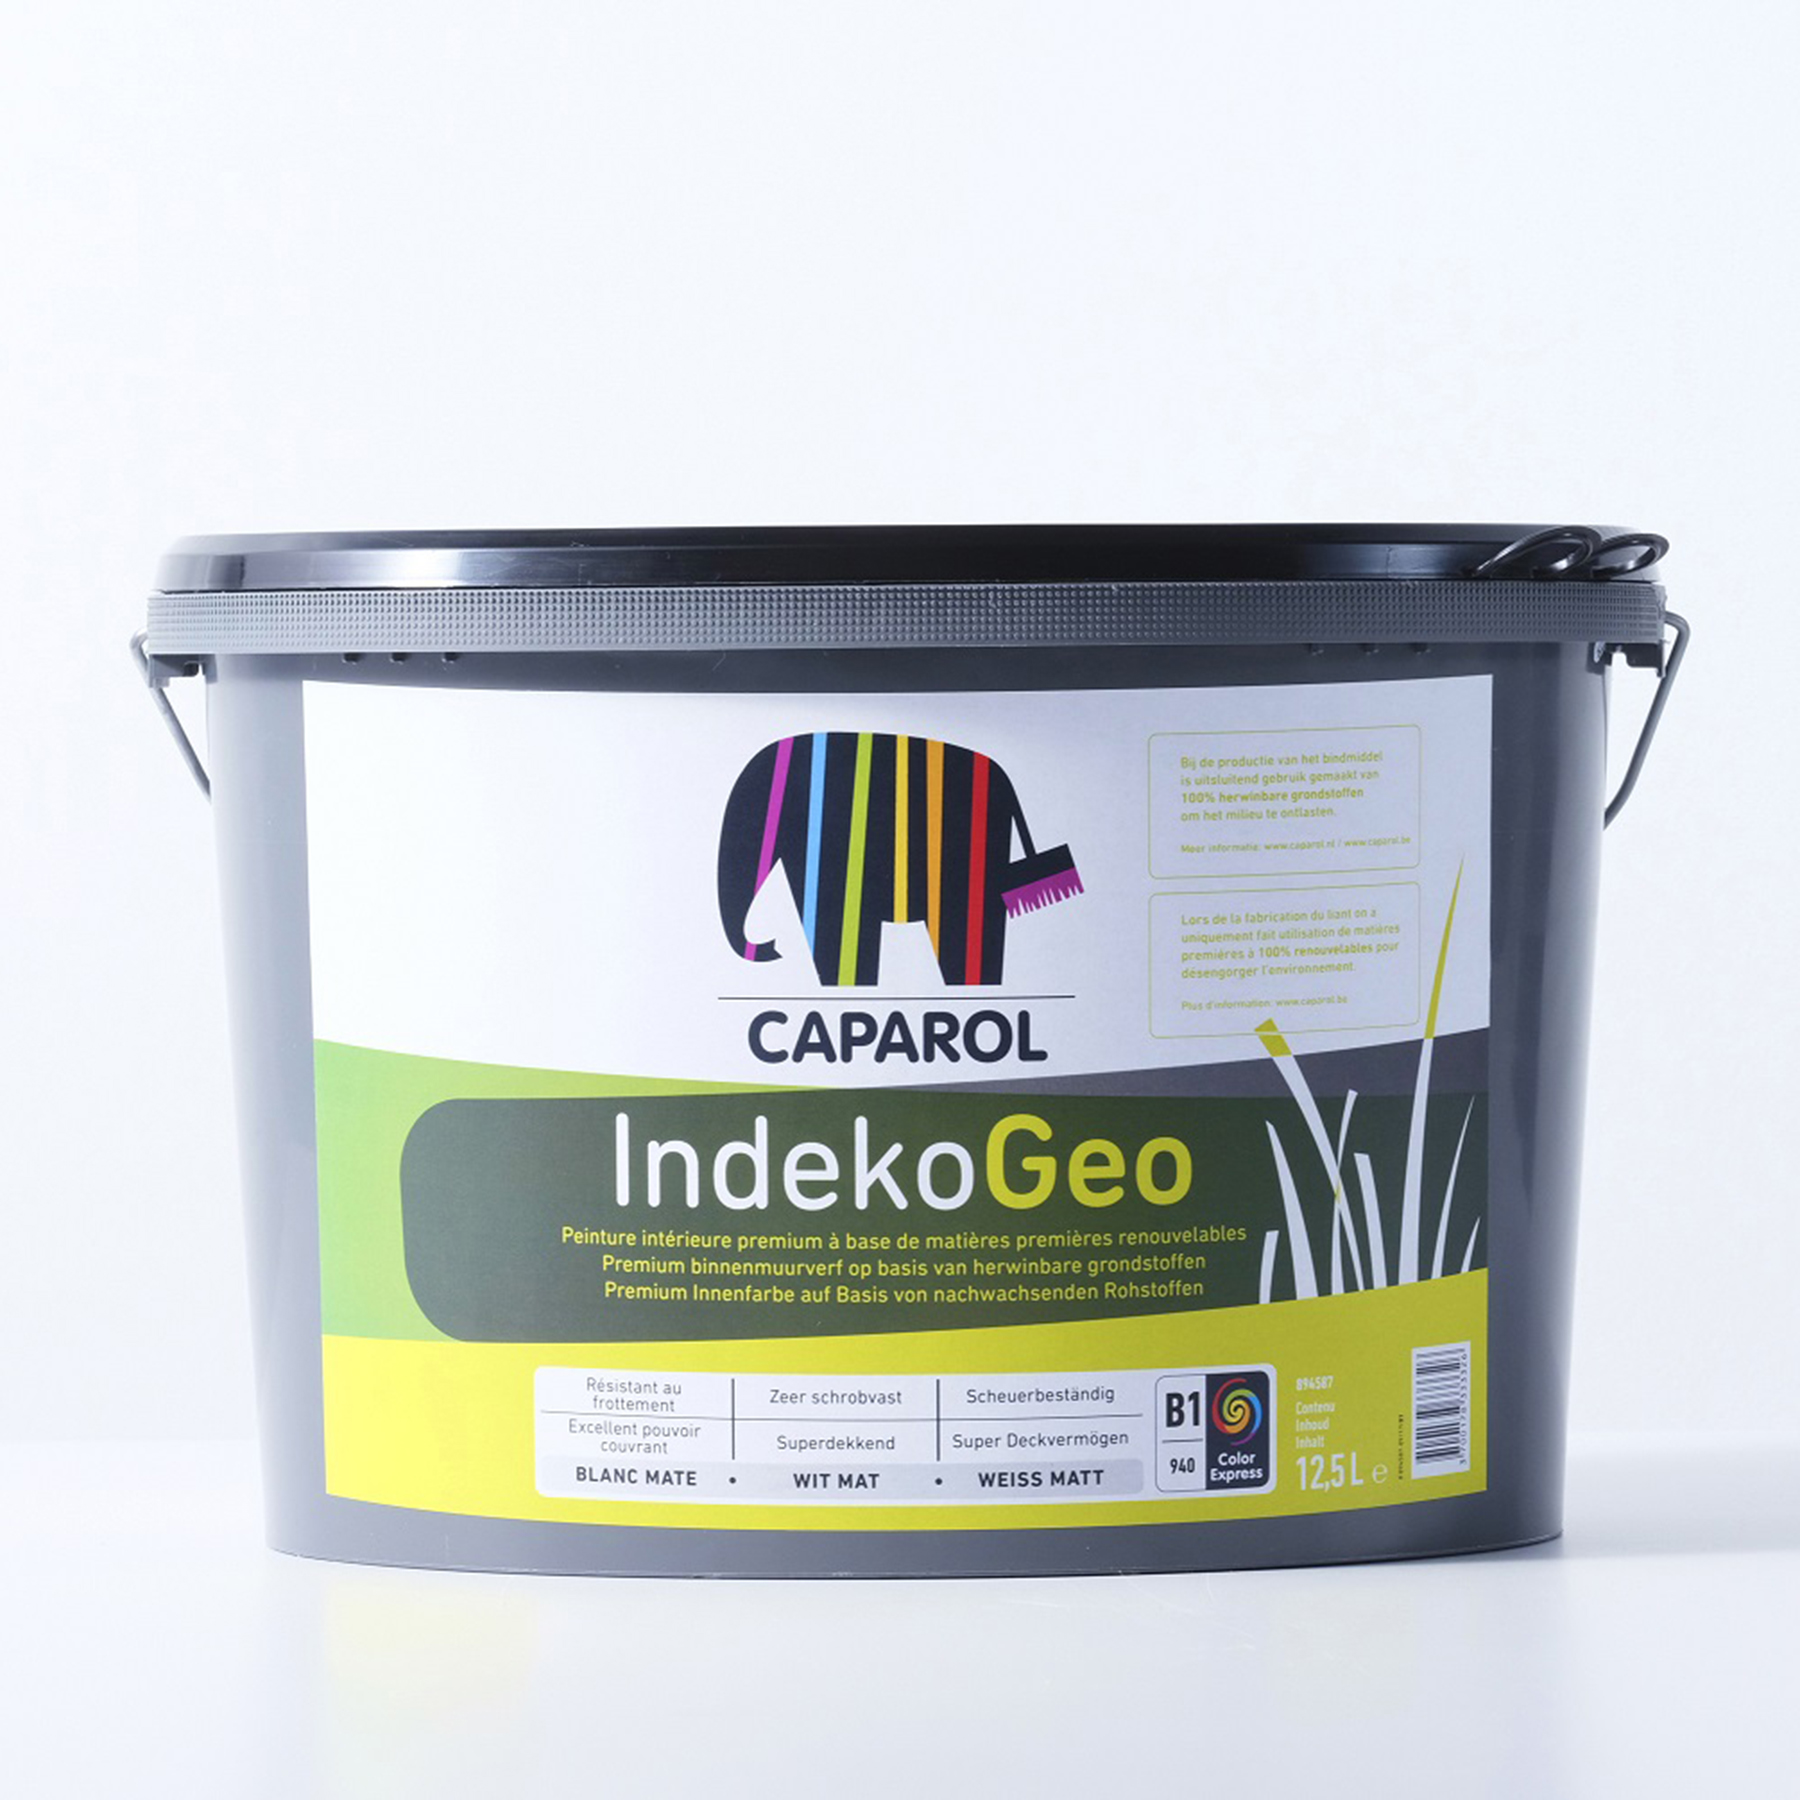 IndekoGeo interior wall paint by CAPAROL | Media - Slideshow